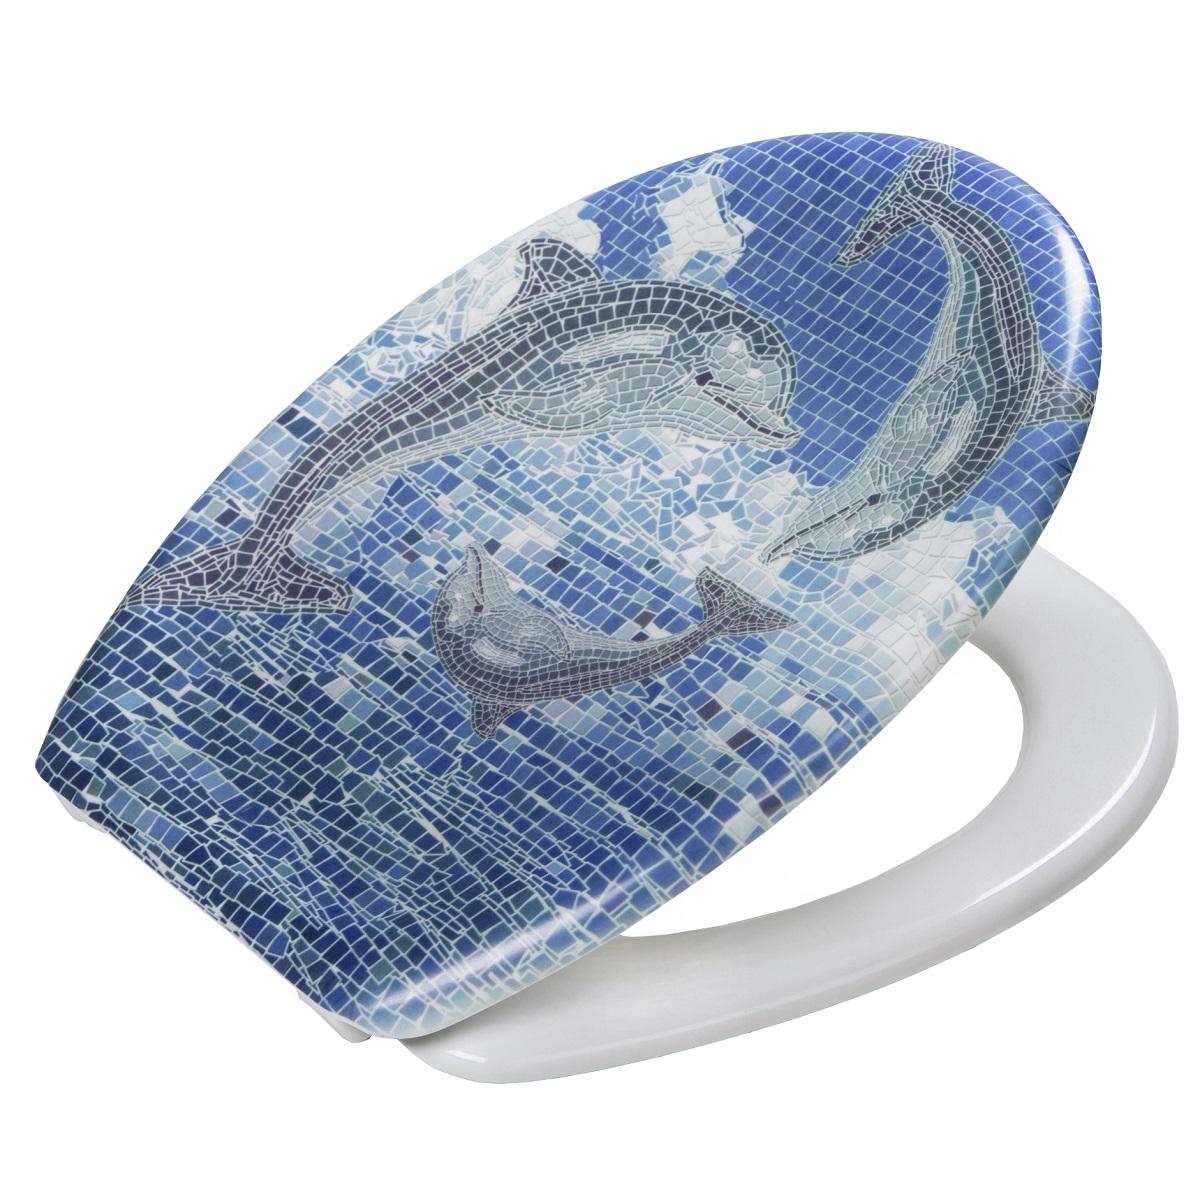 toilettensitz wc sitz toilettendeckel klo deckel klobrille mosaik delphin blau ebay. Black Bedroom Furniture Sets. Home Design Ideas